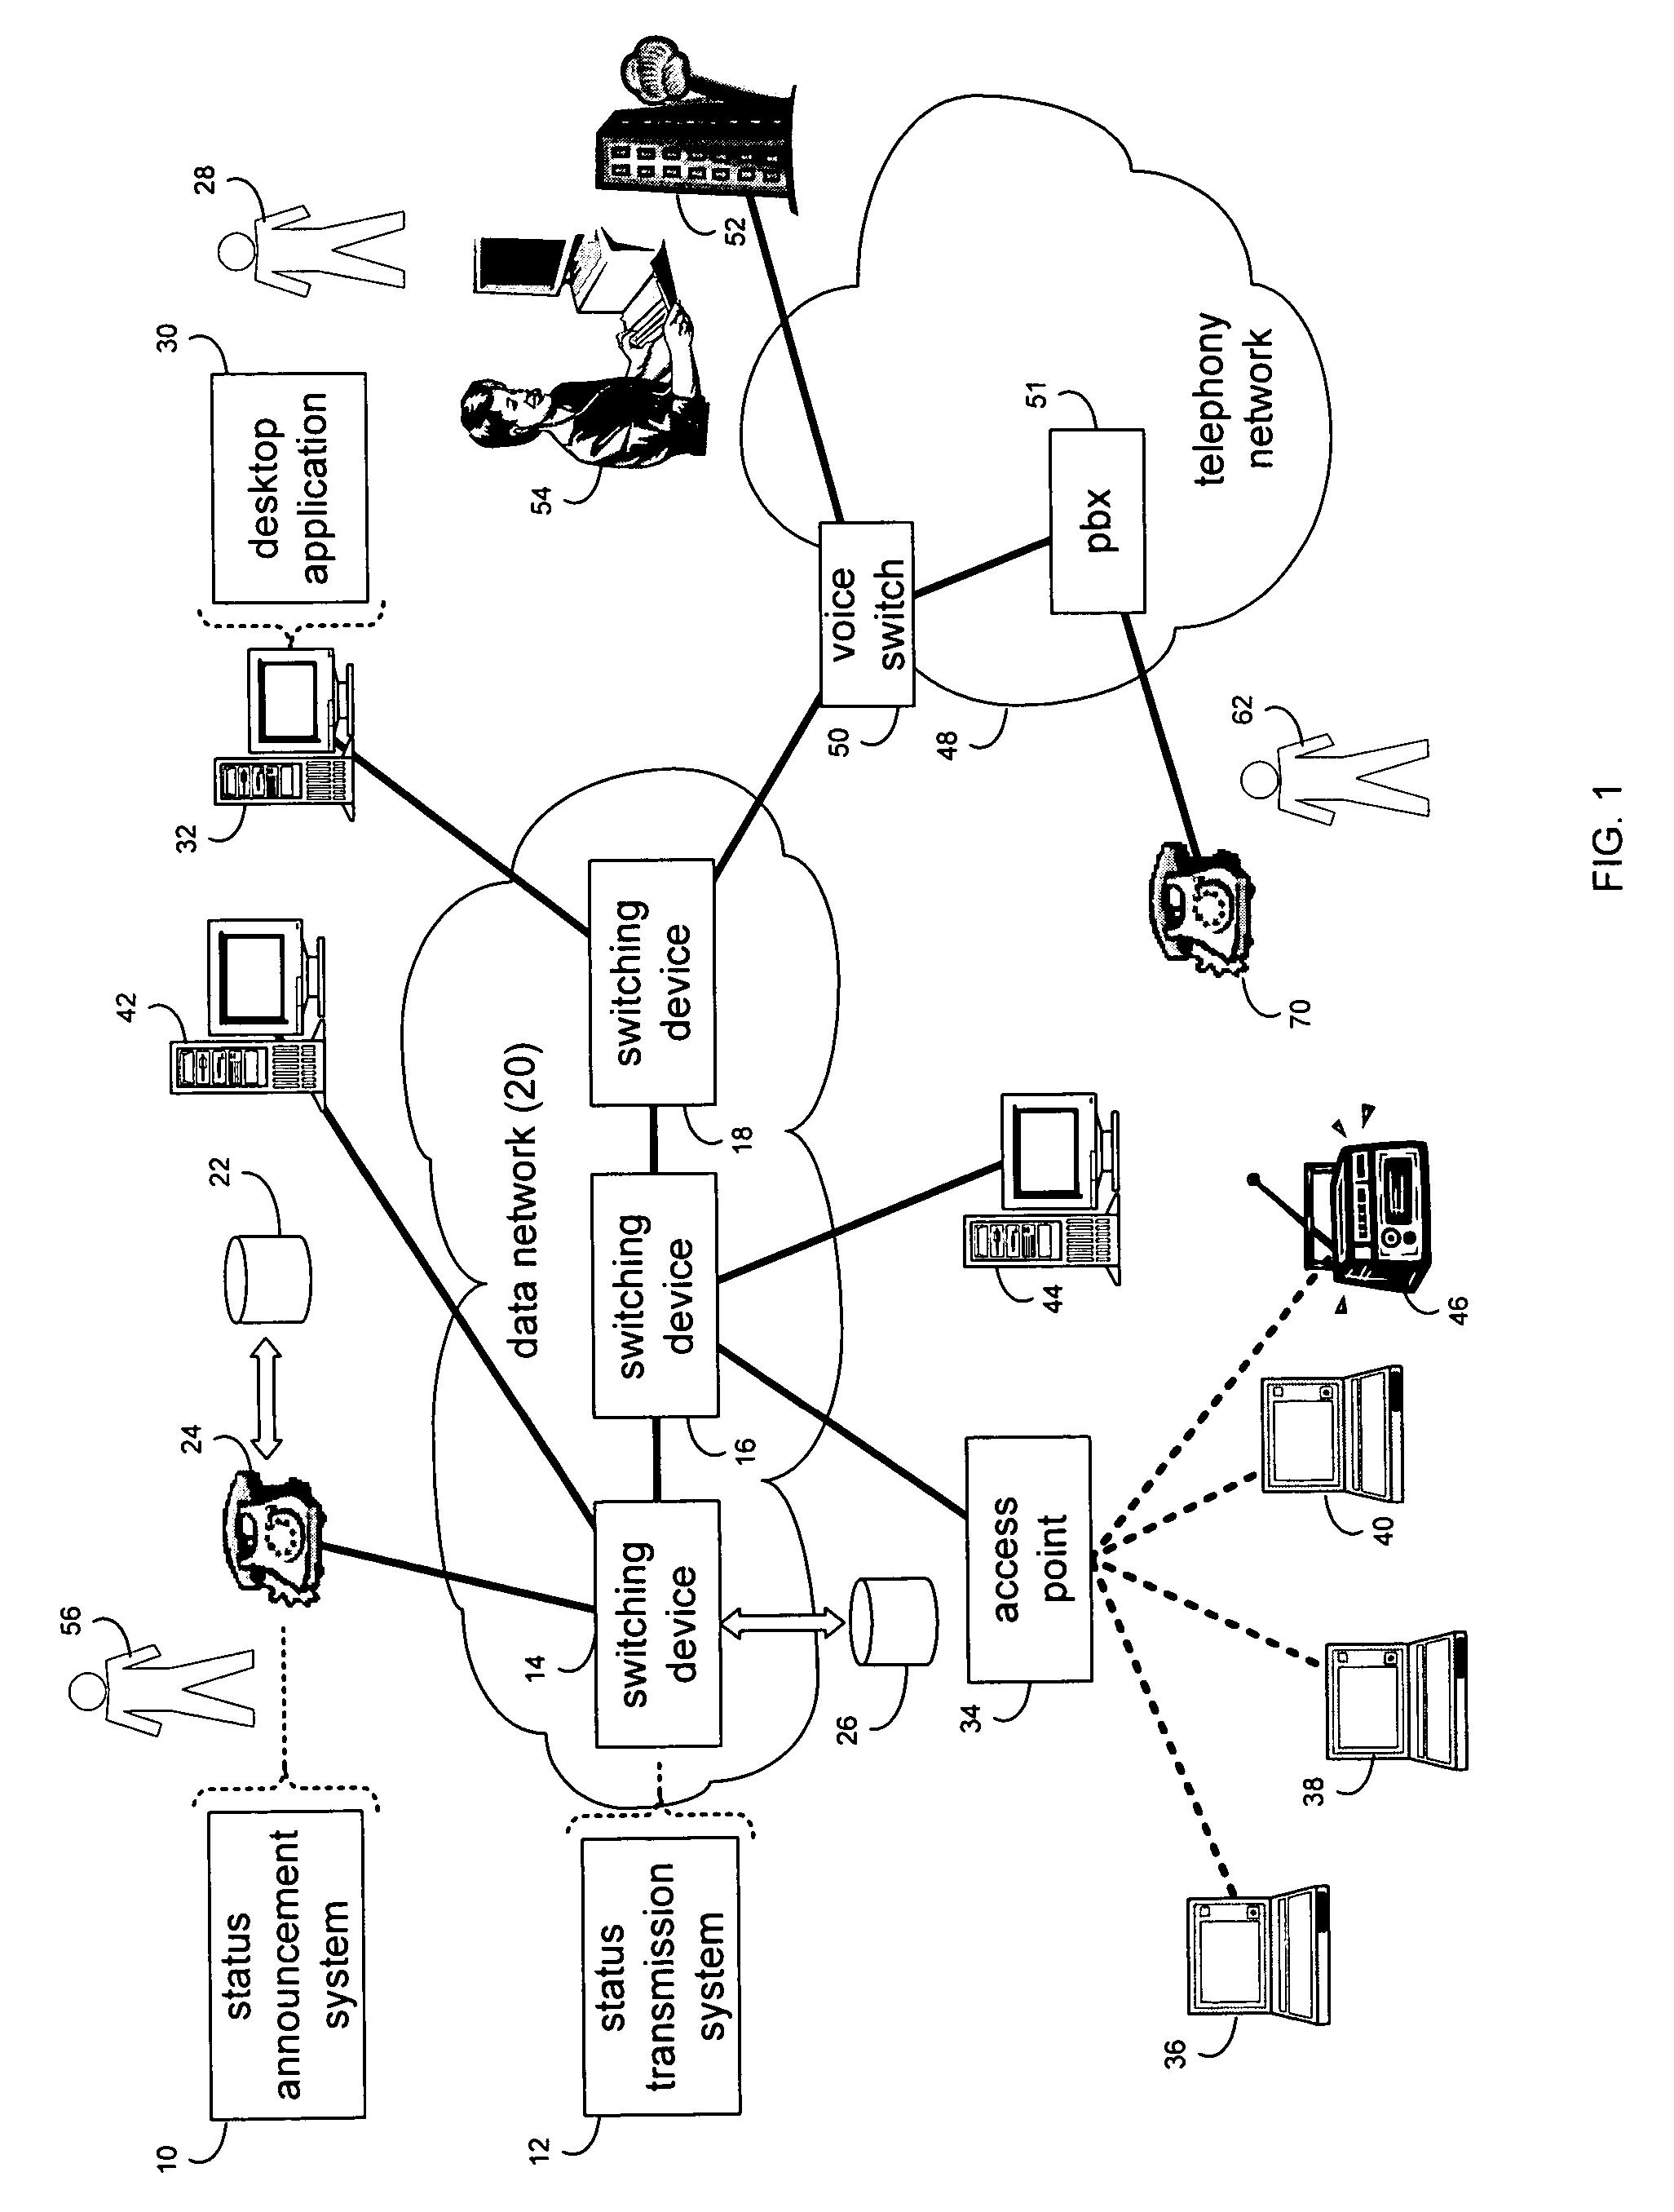 61 Willys Utility Wagon Wiring Diagram, 61, Free Engine